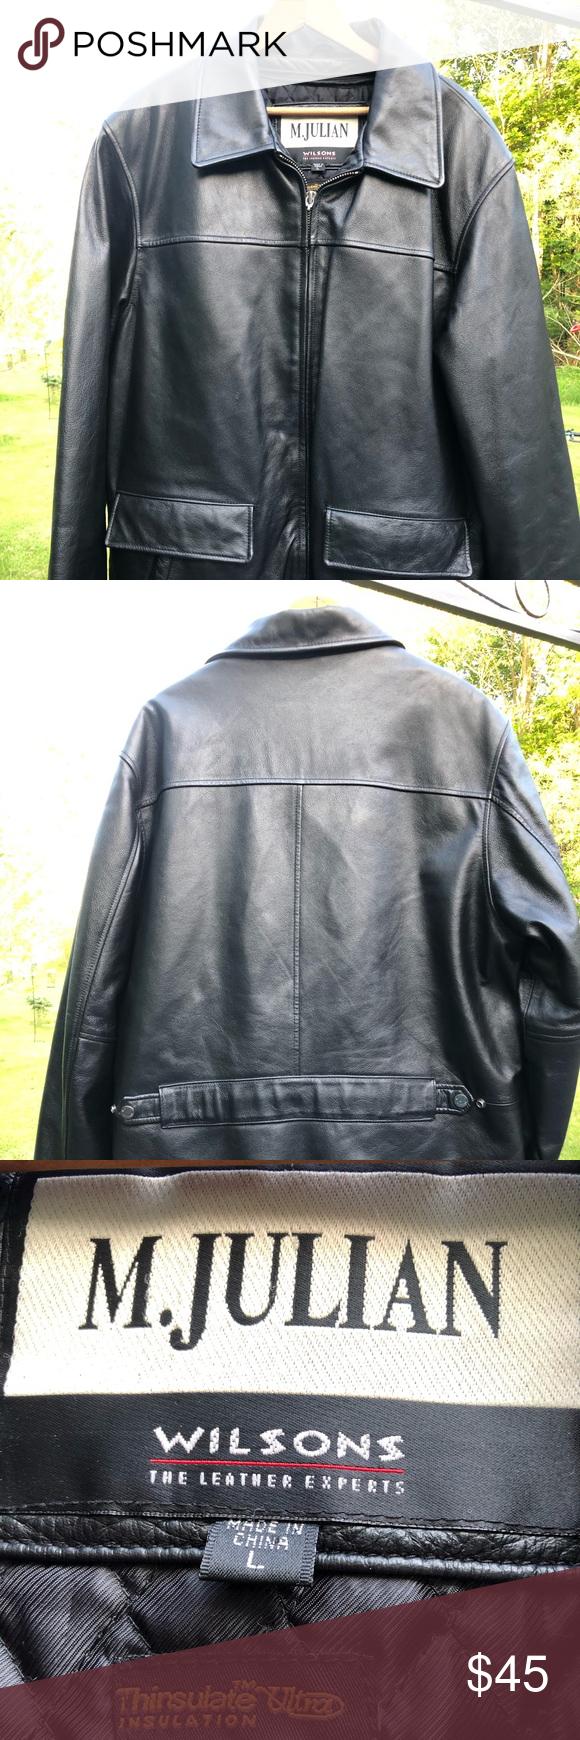 Men S Large Wilson S Leather Coat Leather Coat Leather Wilsons Leather [ 1740 x 580 Pixel ]